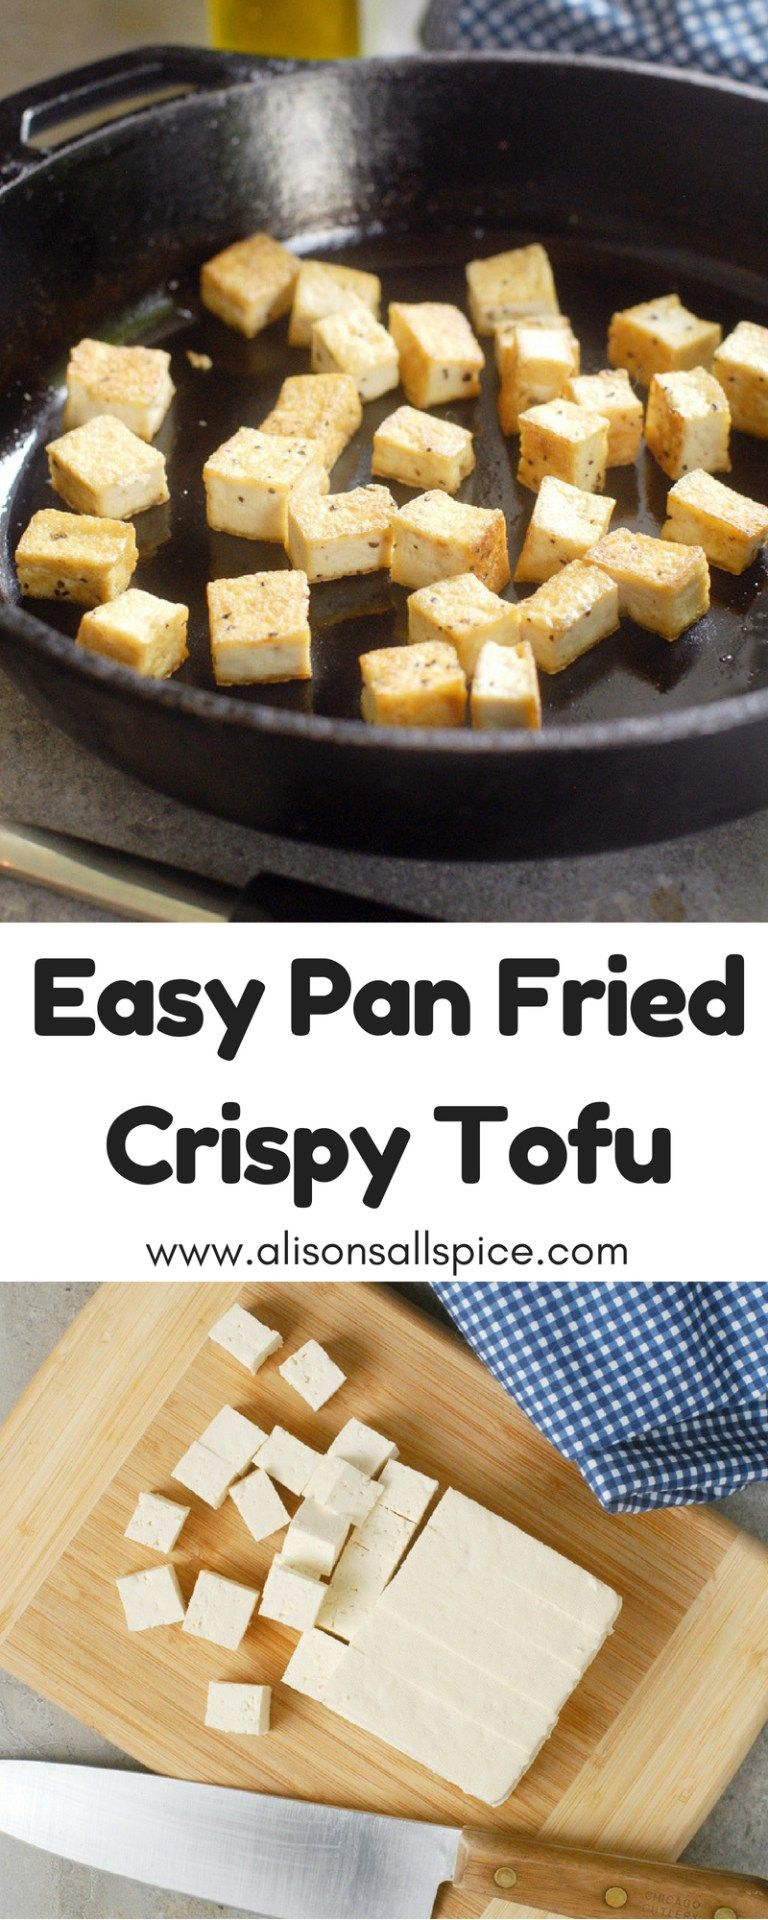 Easy Pan Fried Crispy Tofu images